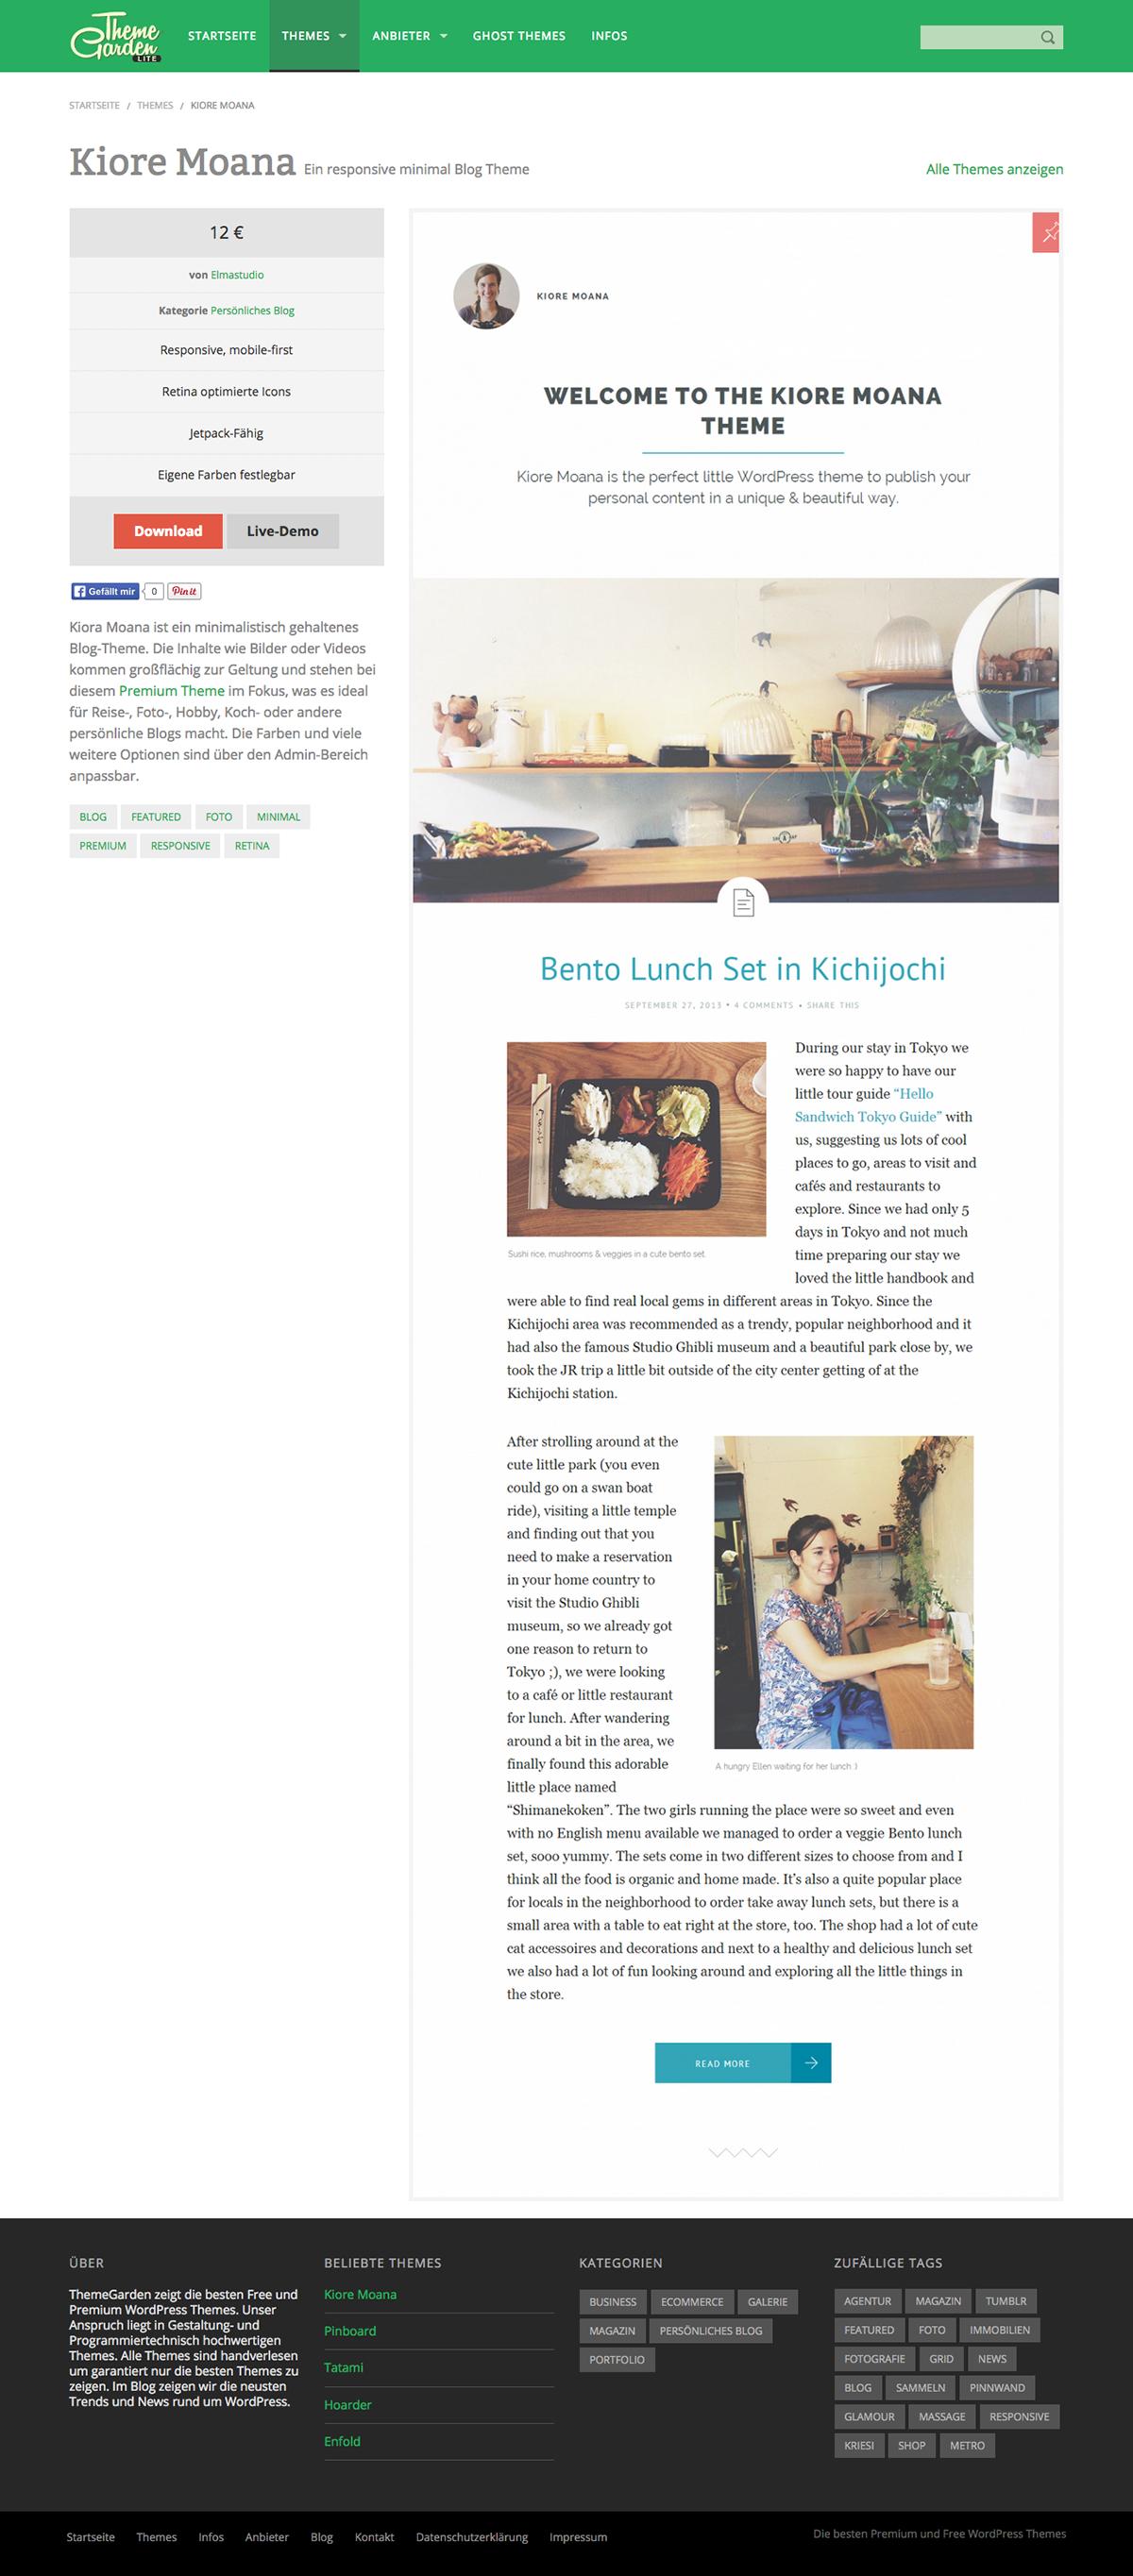 ThemeGarden - A WordPress Theme Gallery